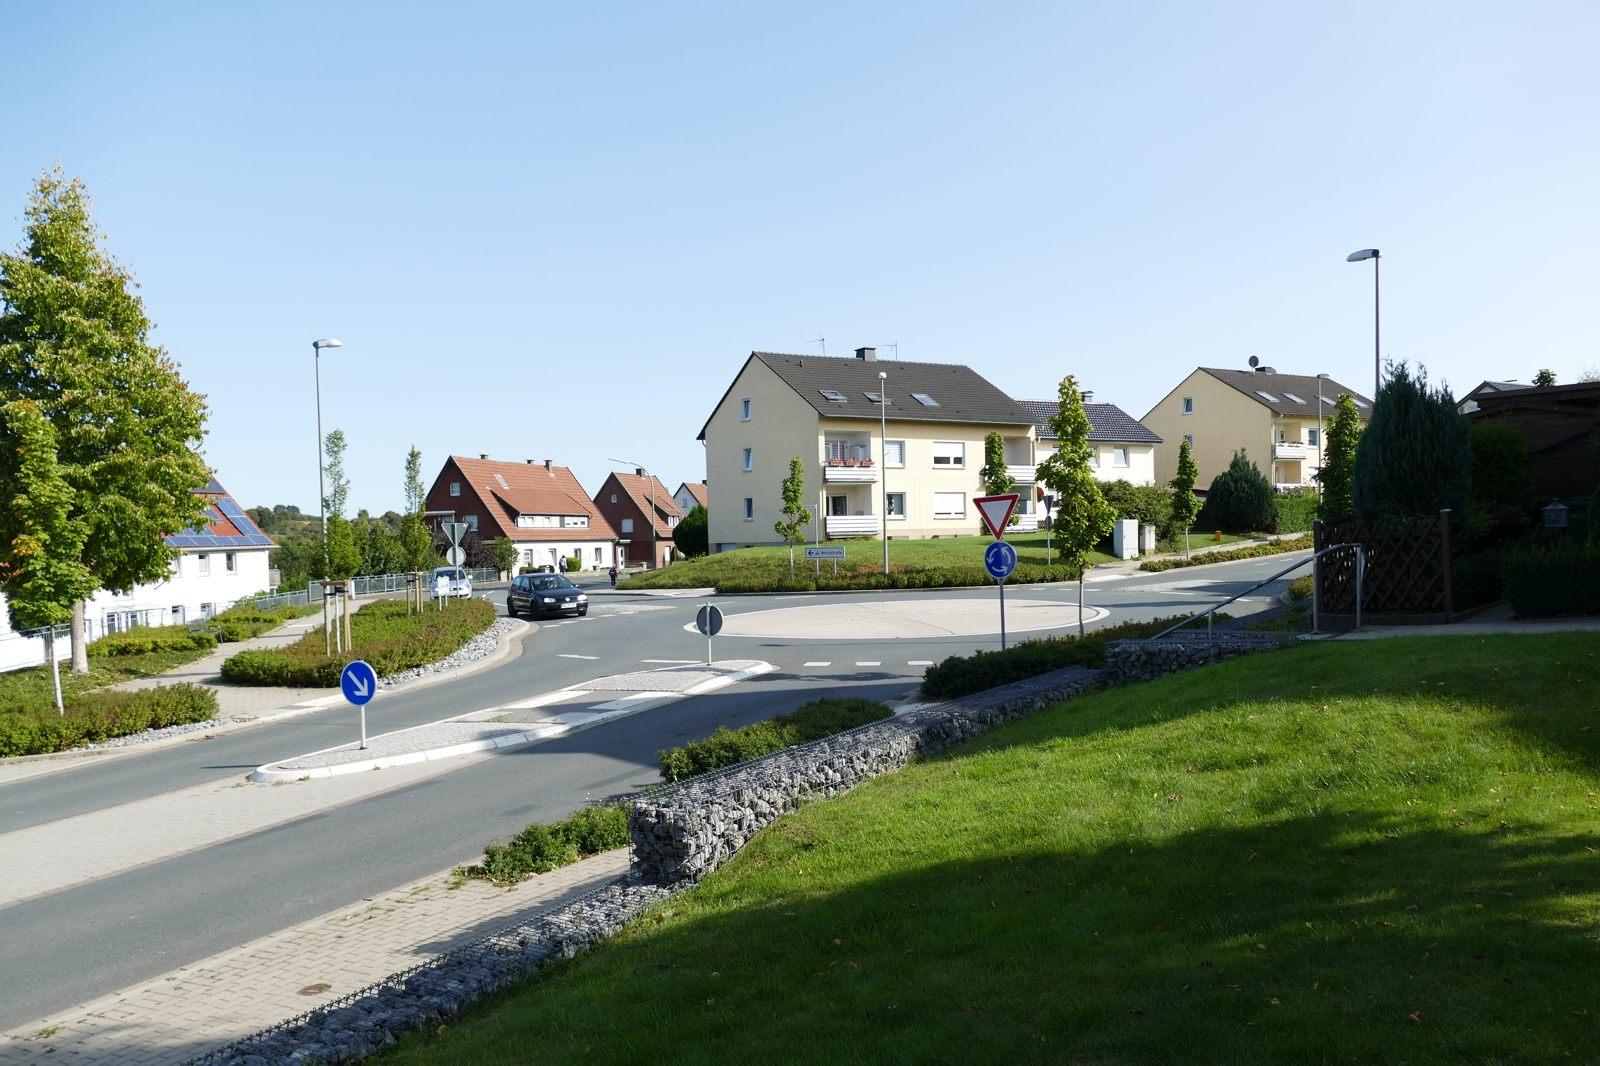 Kreisverkehr Barkhäuser Straße/Hegensdorfer Straße